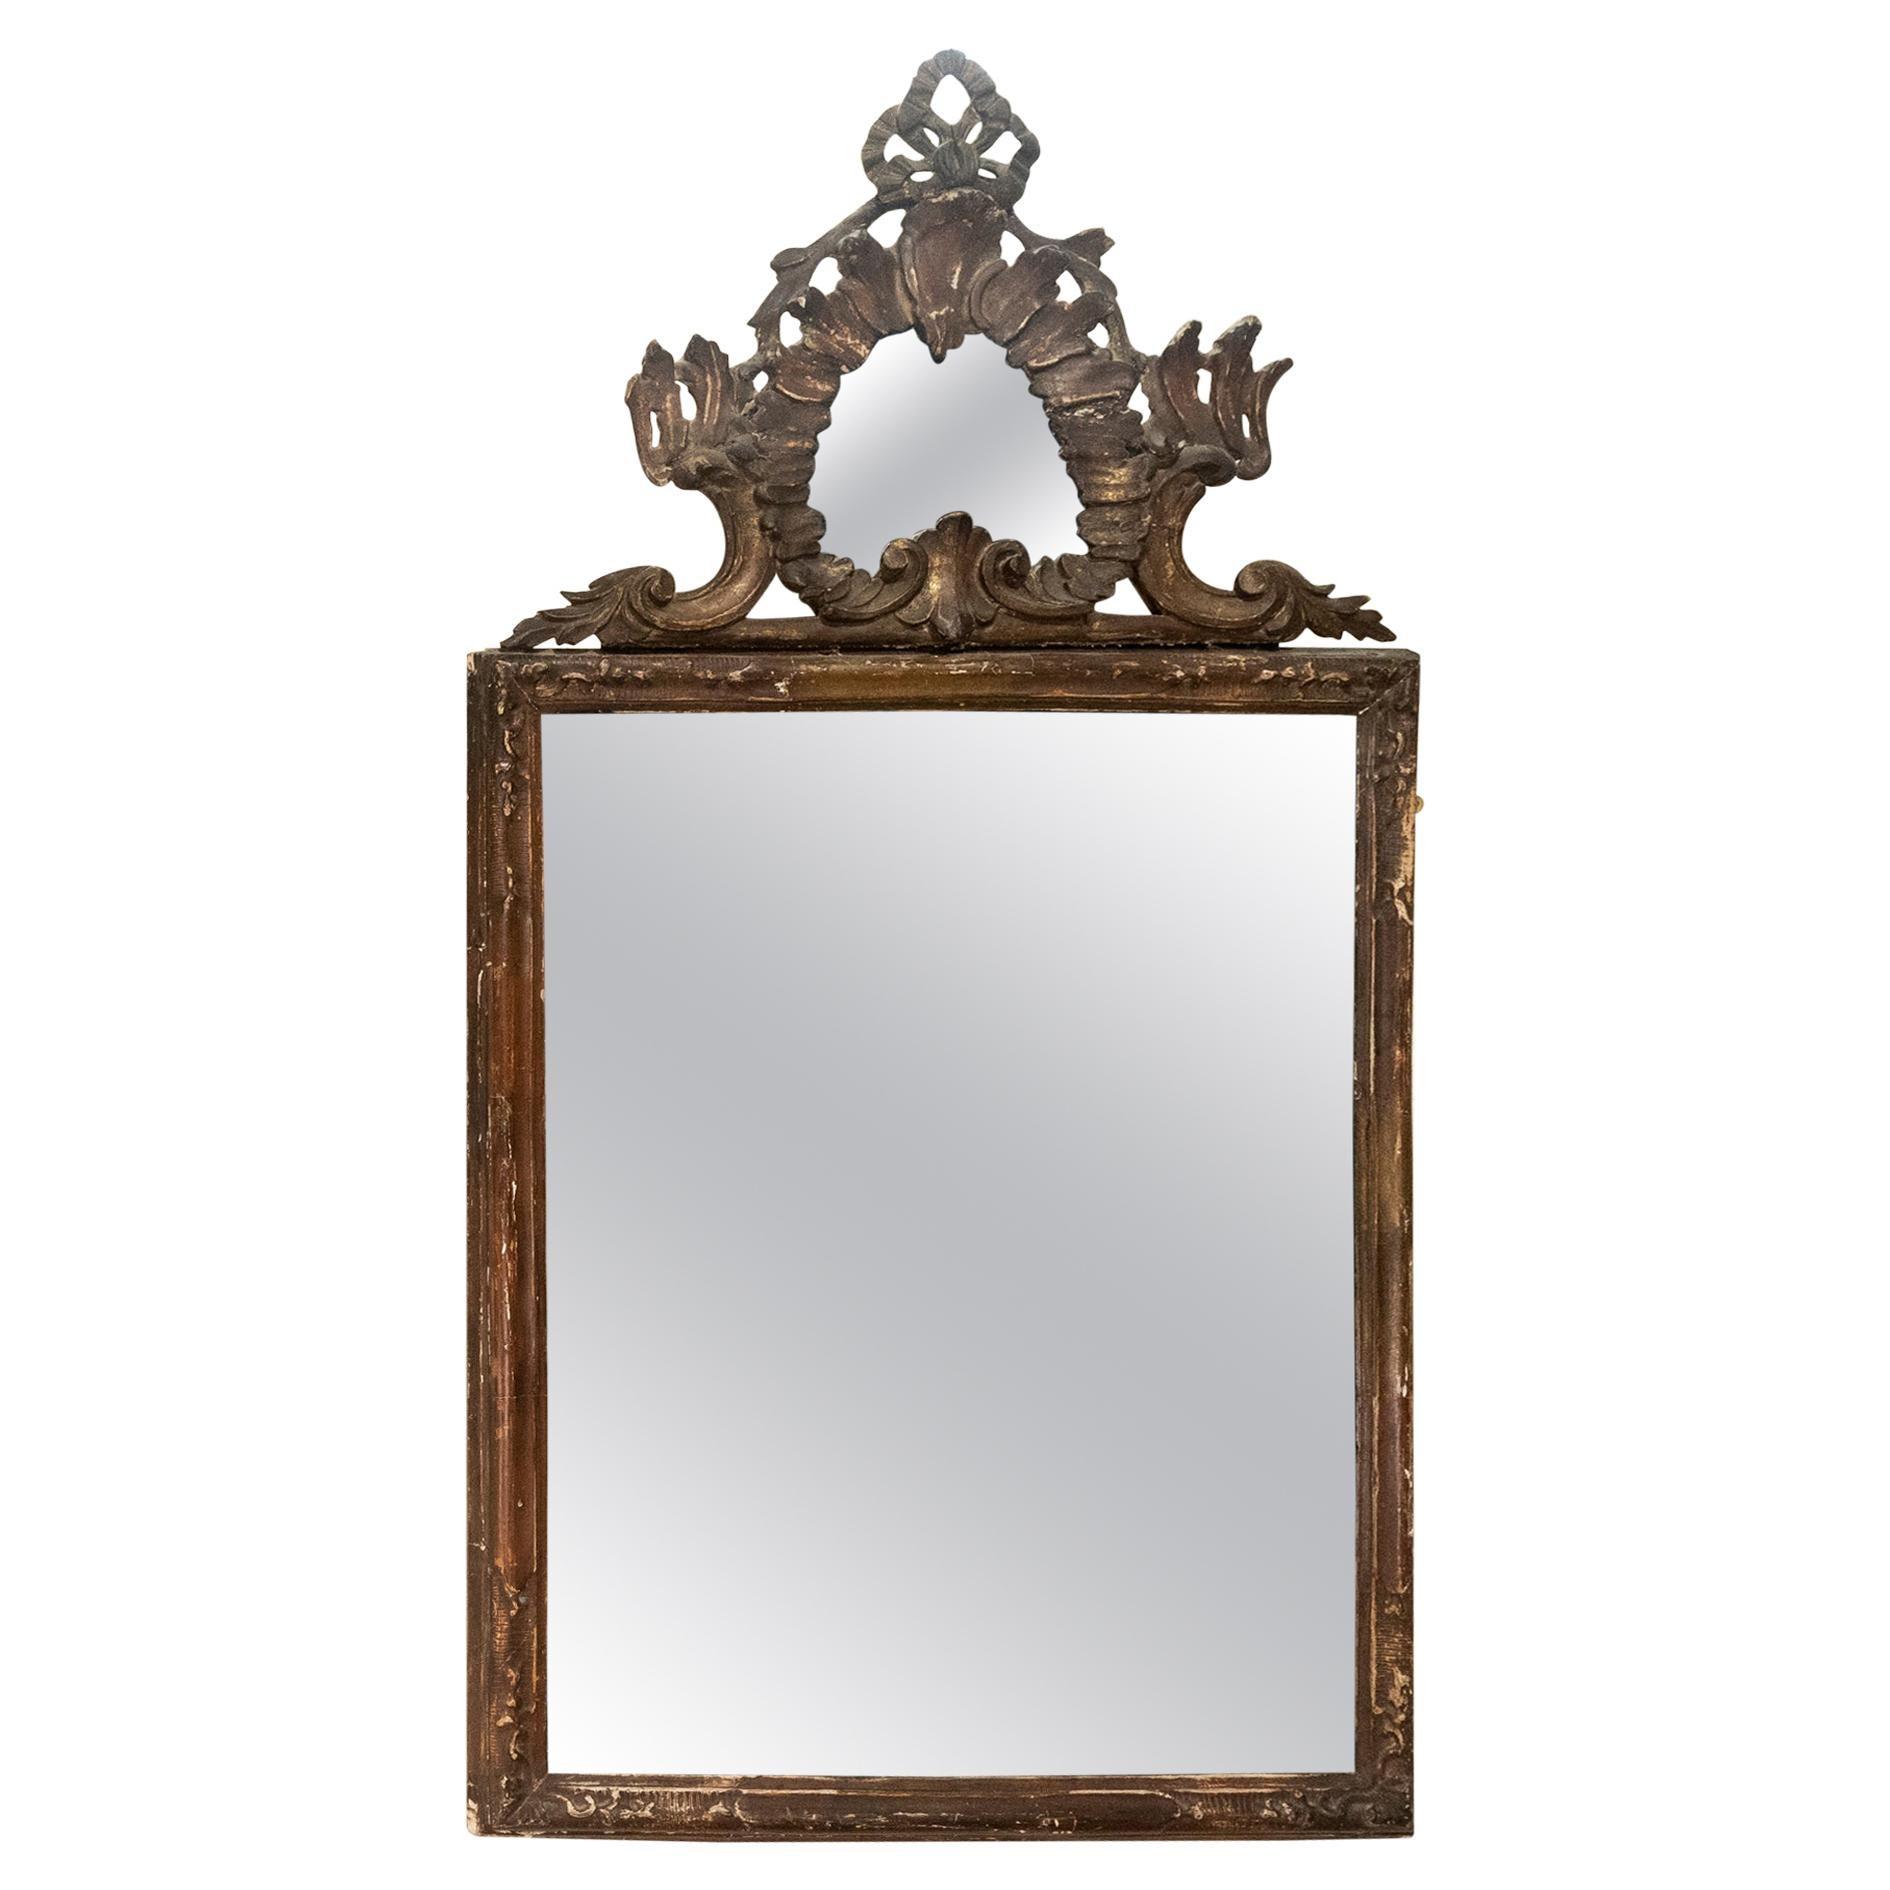 Large 18th Century Italian Rococo Wall Mirror